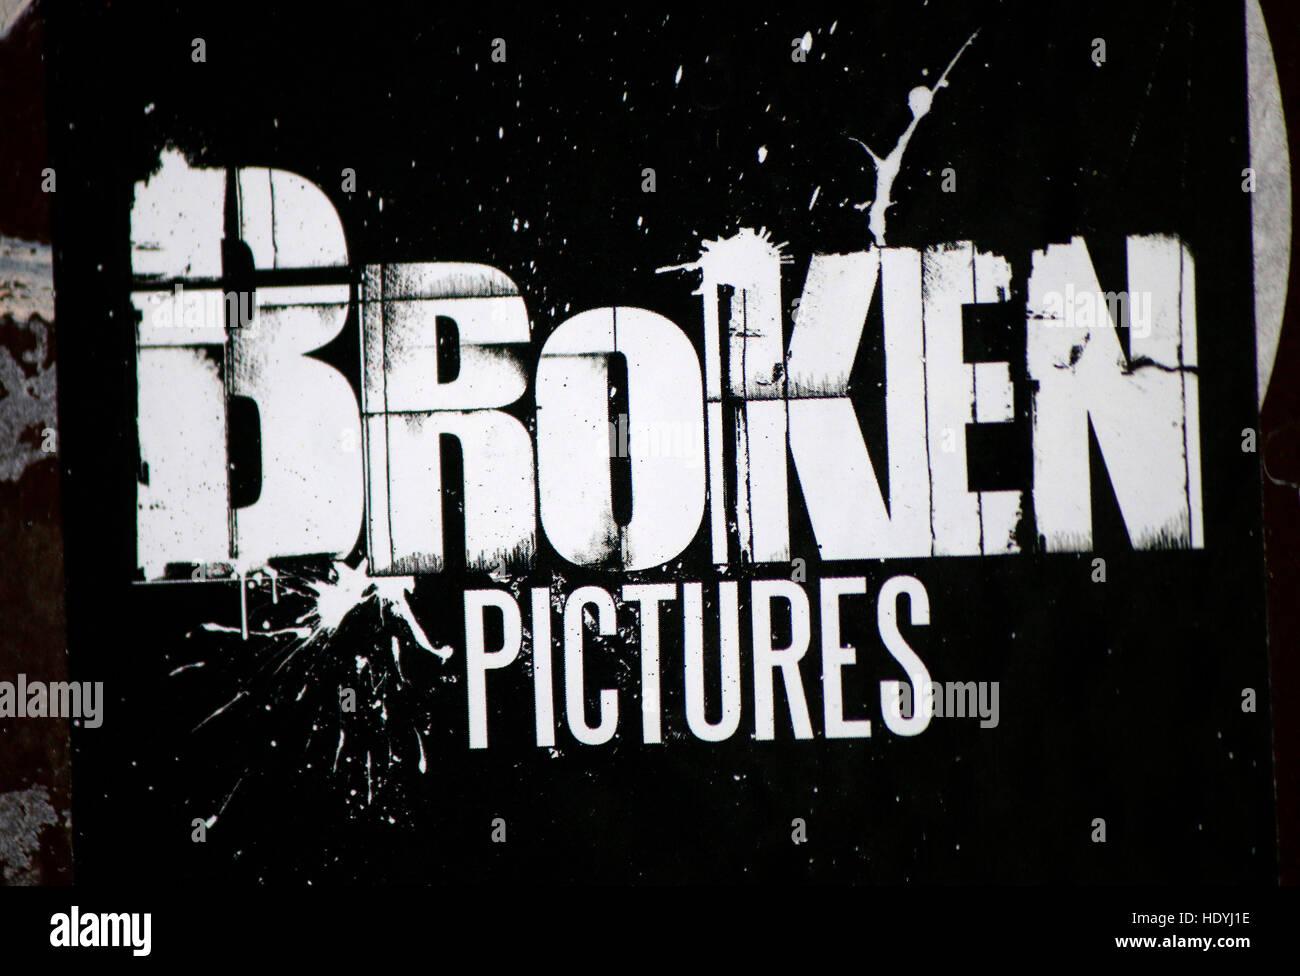 Broken logo stock photos broken logo stock images alamy das logo der marke broken pictures berlin thecheapjerseys Gallery